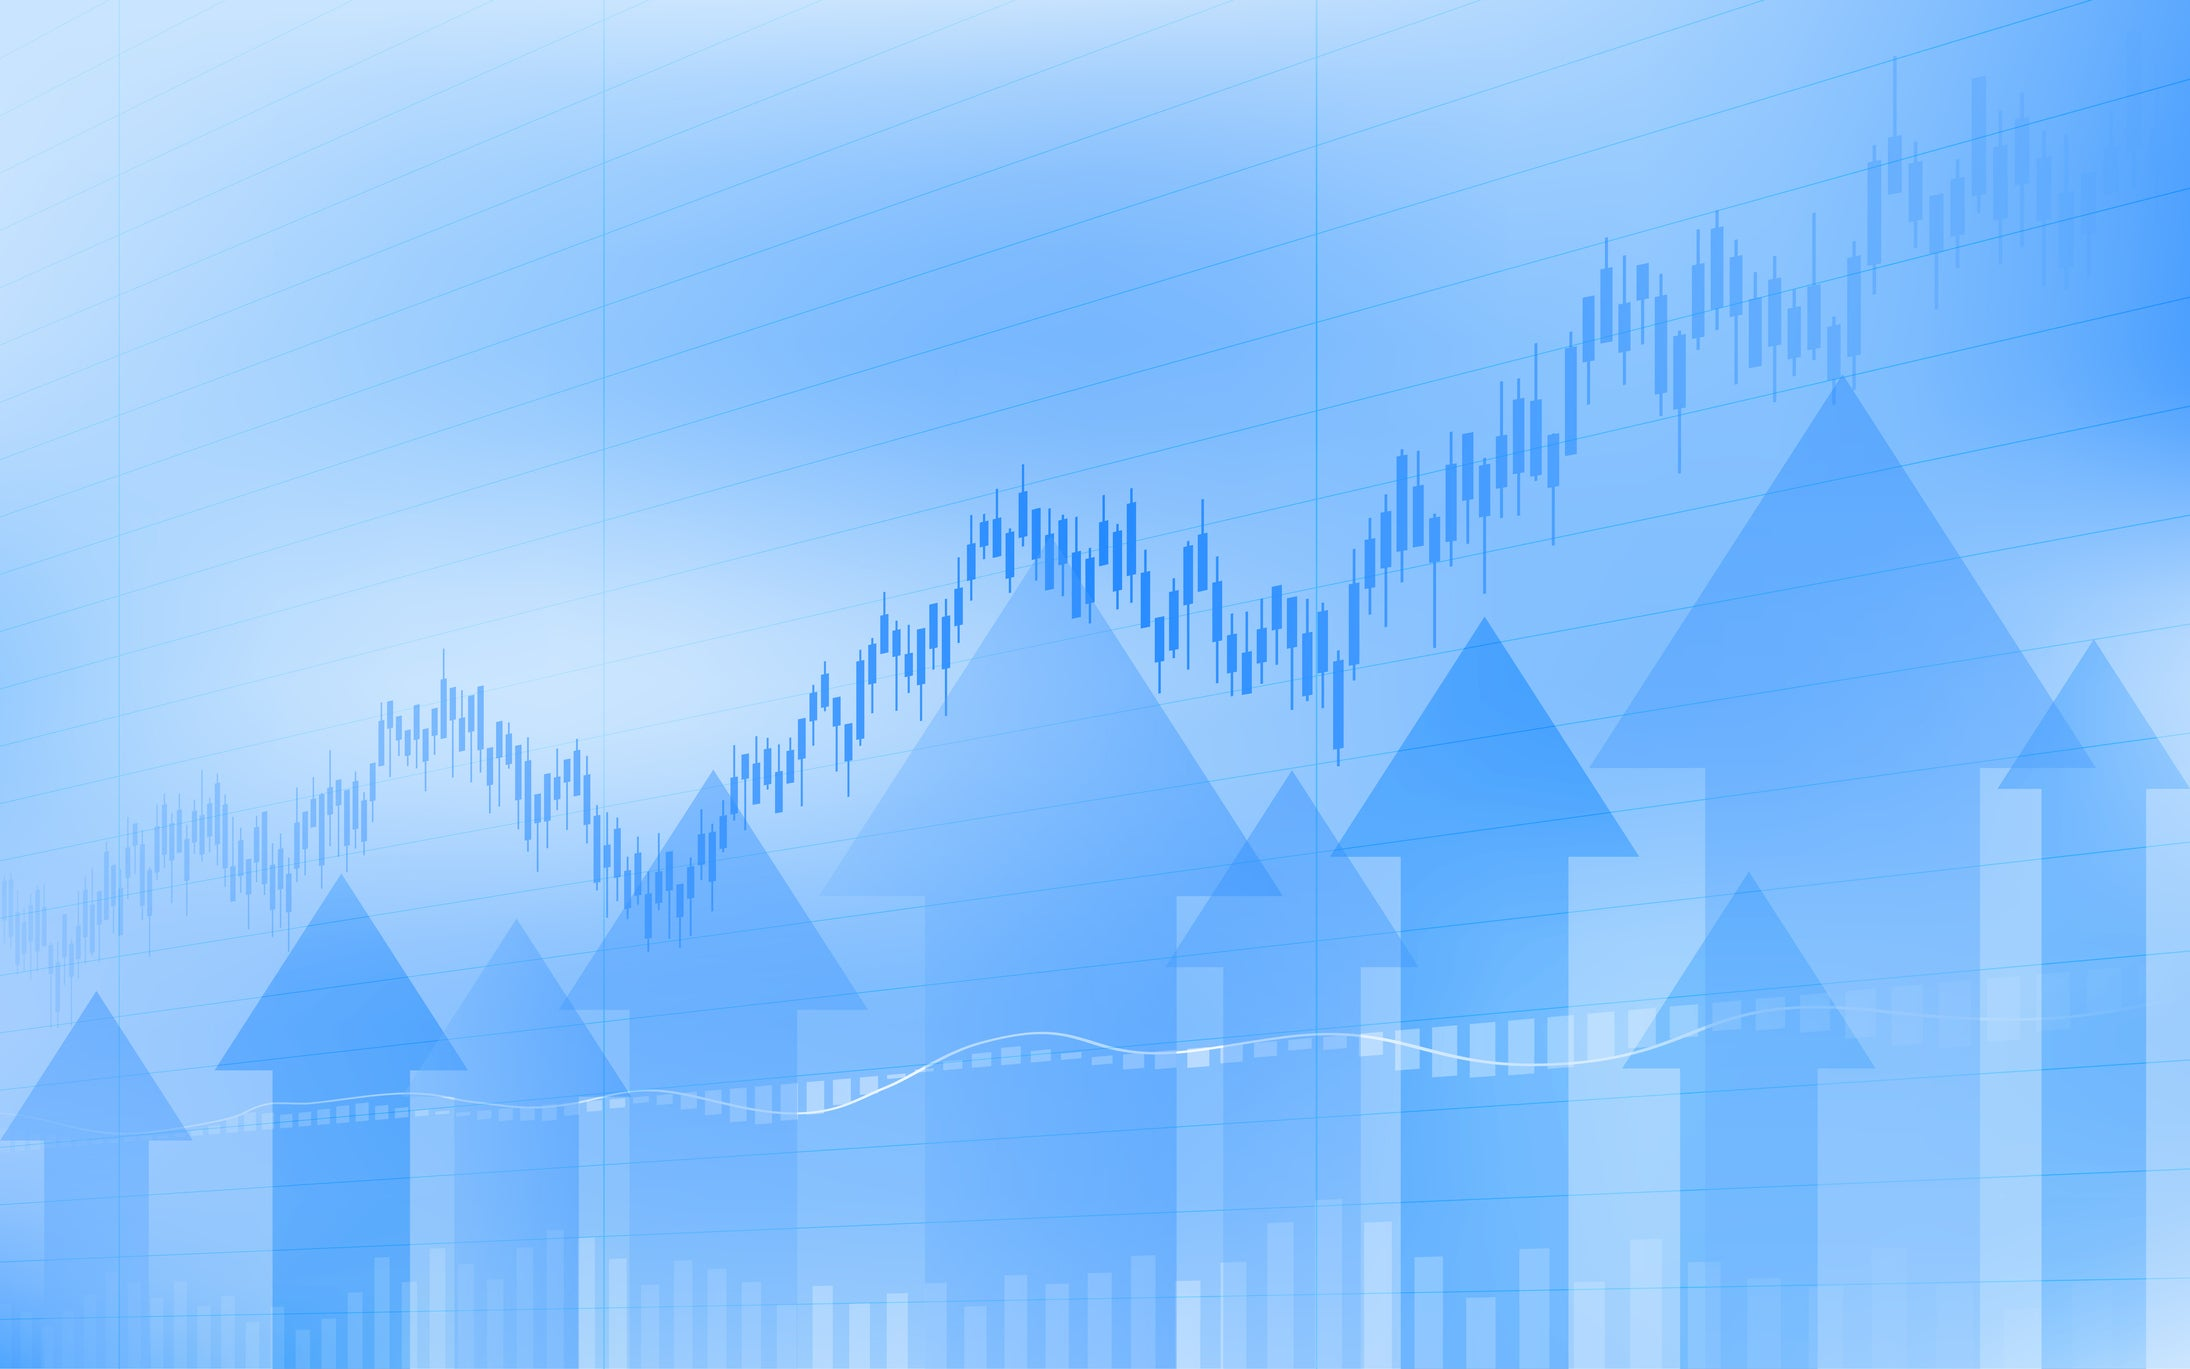 Rising graph and upward arrows in various shades of blue